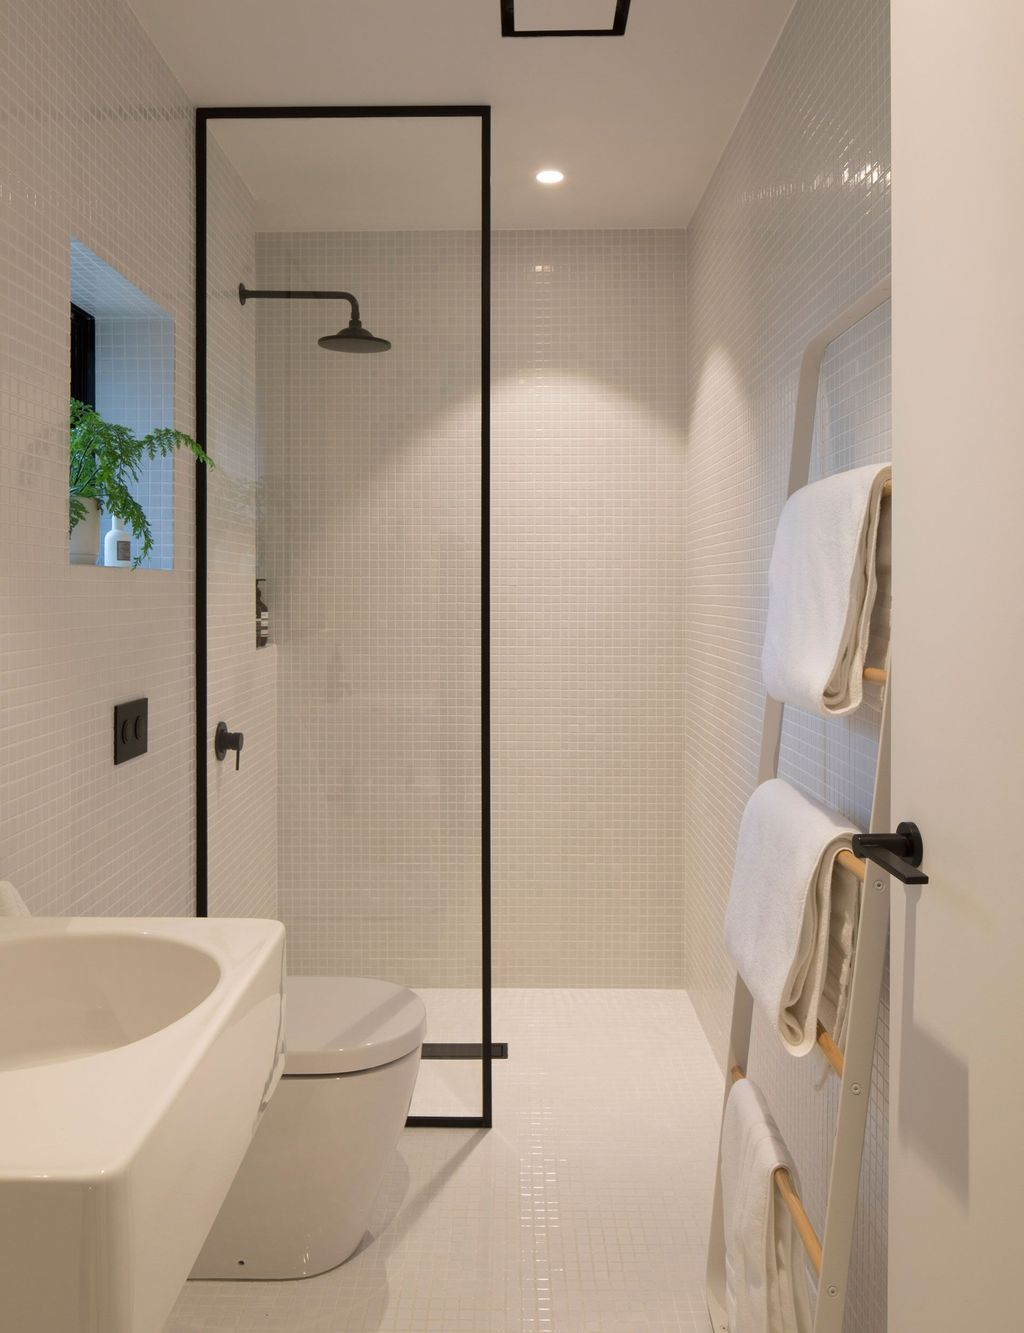 Fabulous Minimalist Bathroom Decor Ideas That Become Everyones Dream 20